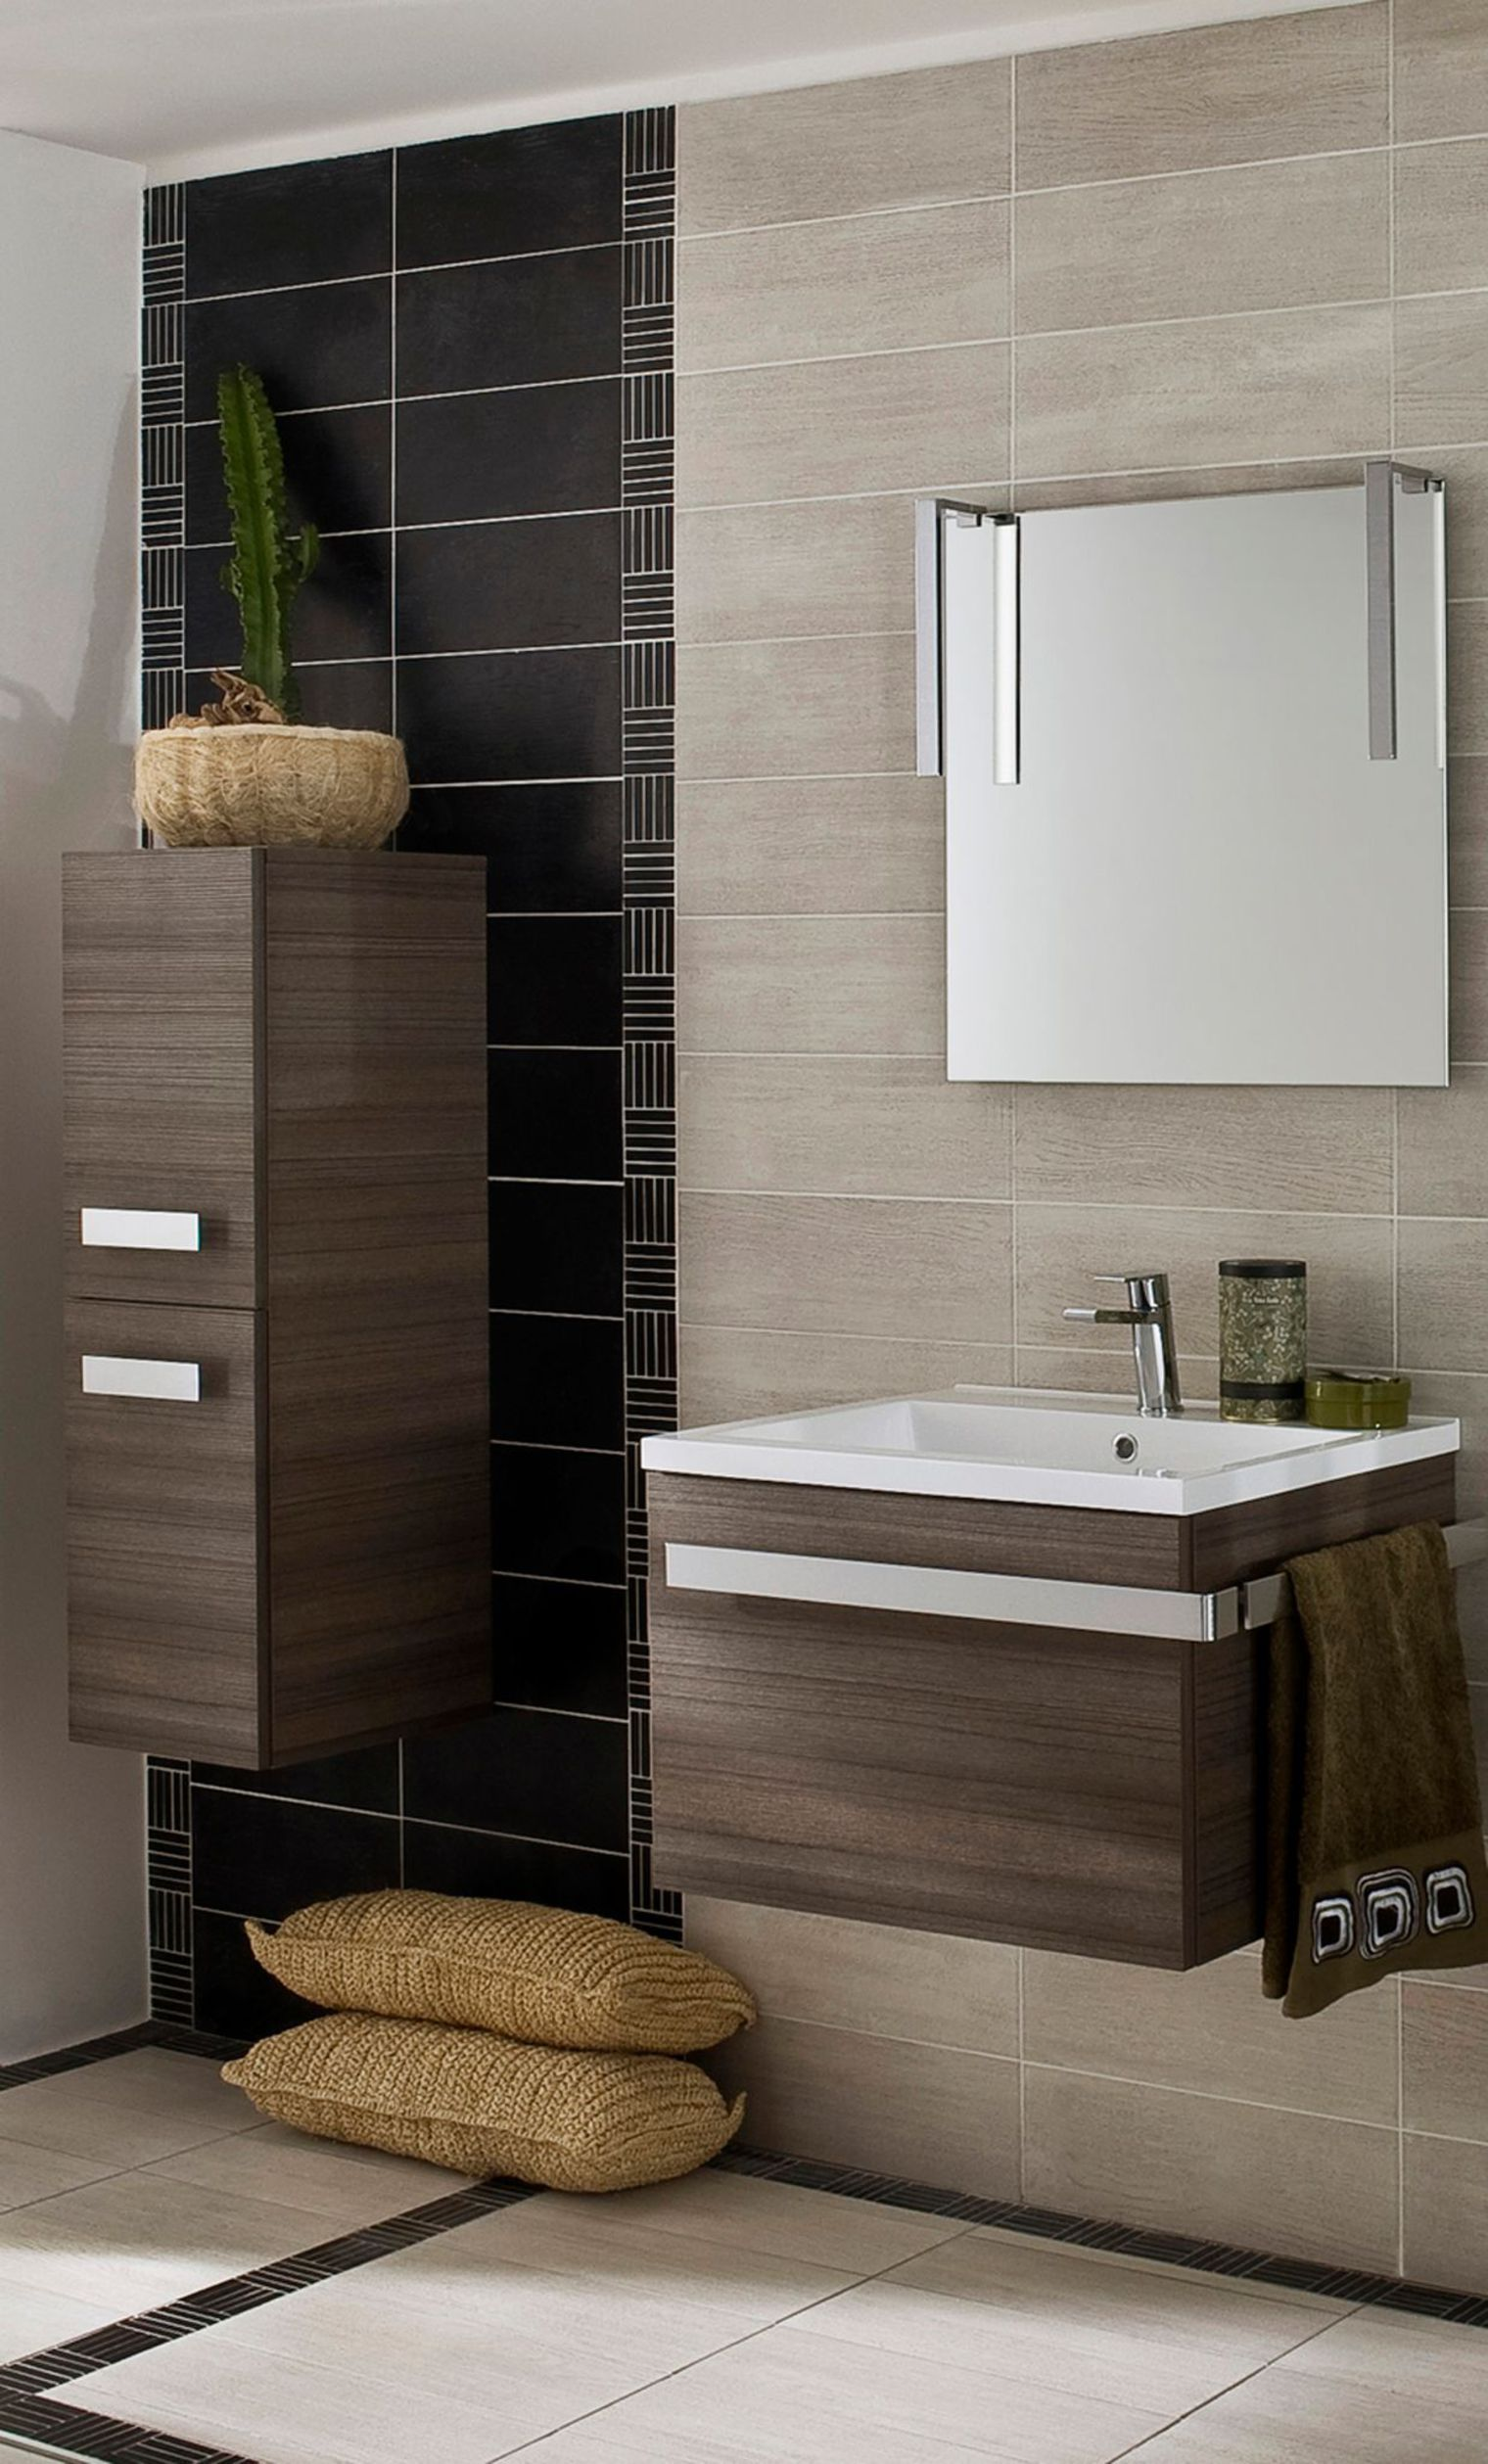 Tapis de salle de bain marron: tapis de salle bain ciuisine. tapis ...